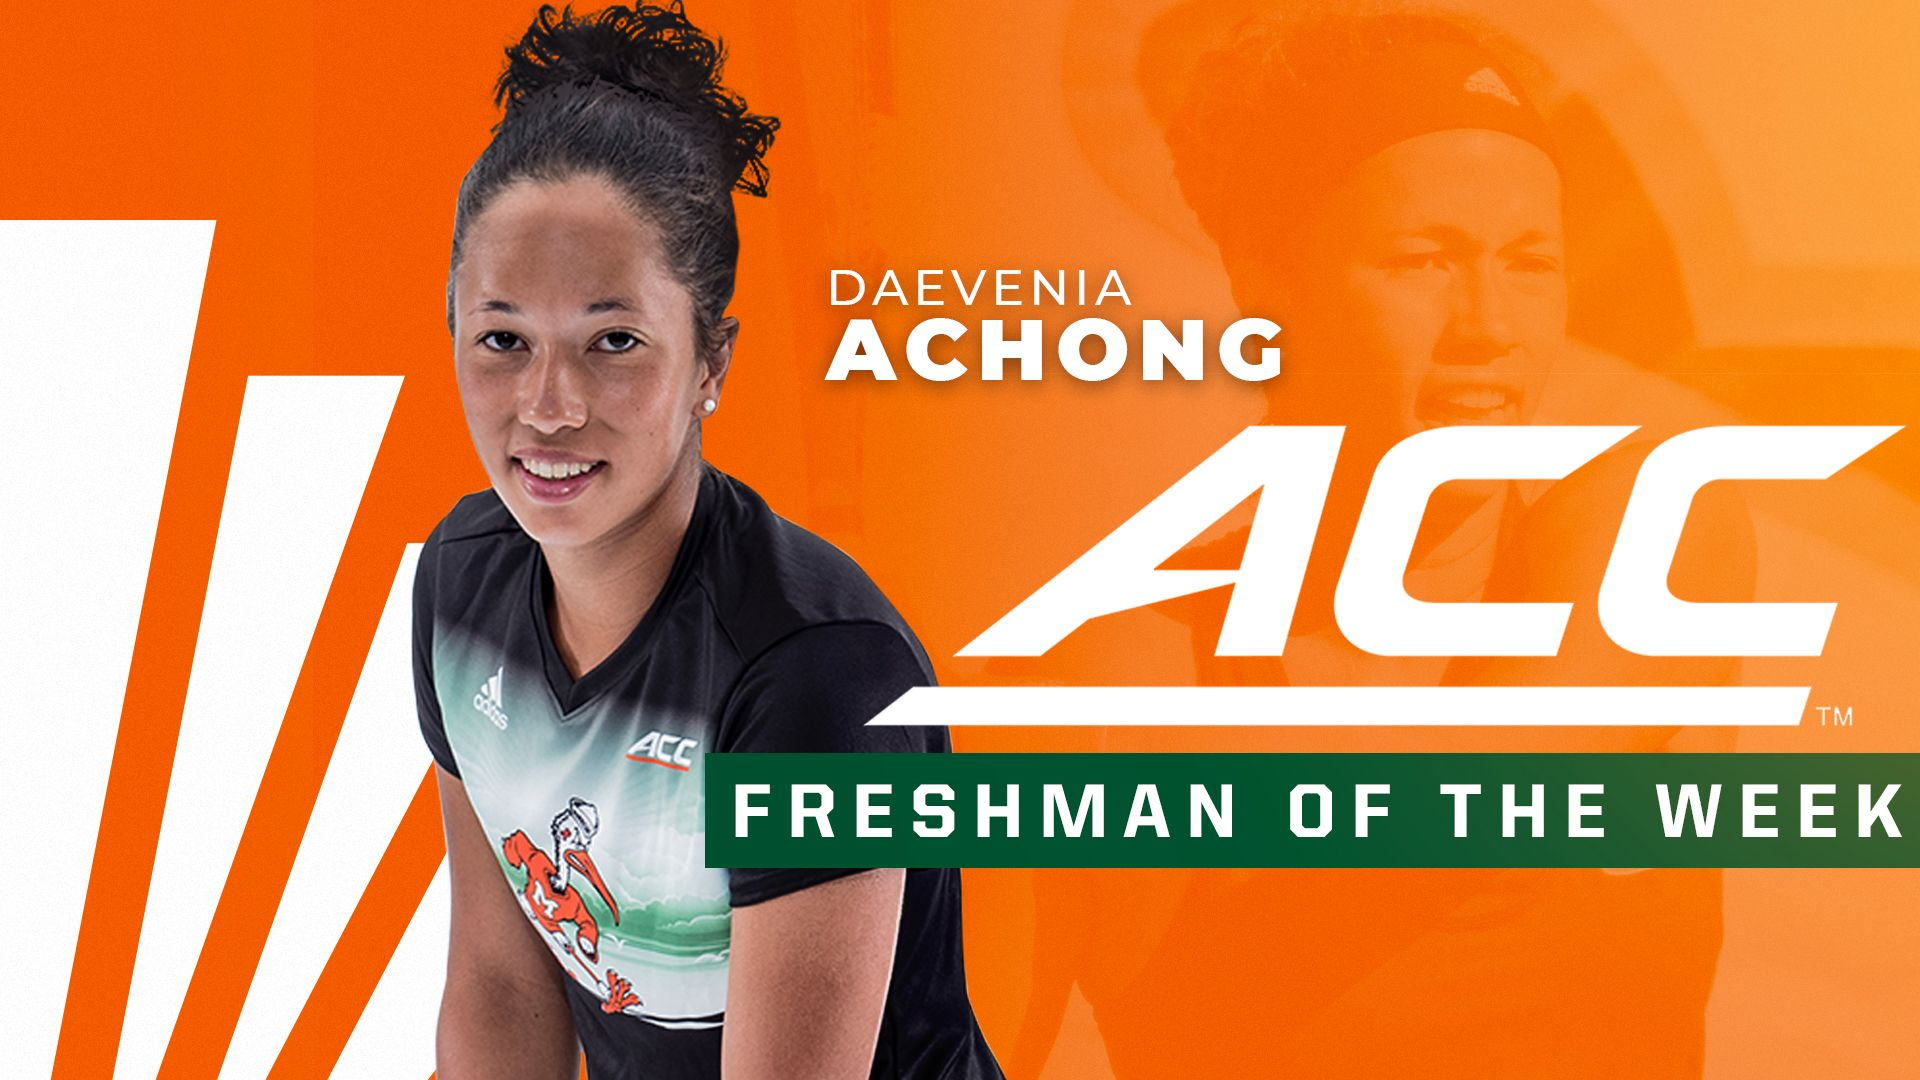 Achong Repeats as ACC Freshman of the Week